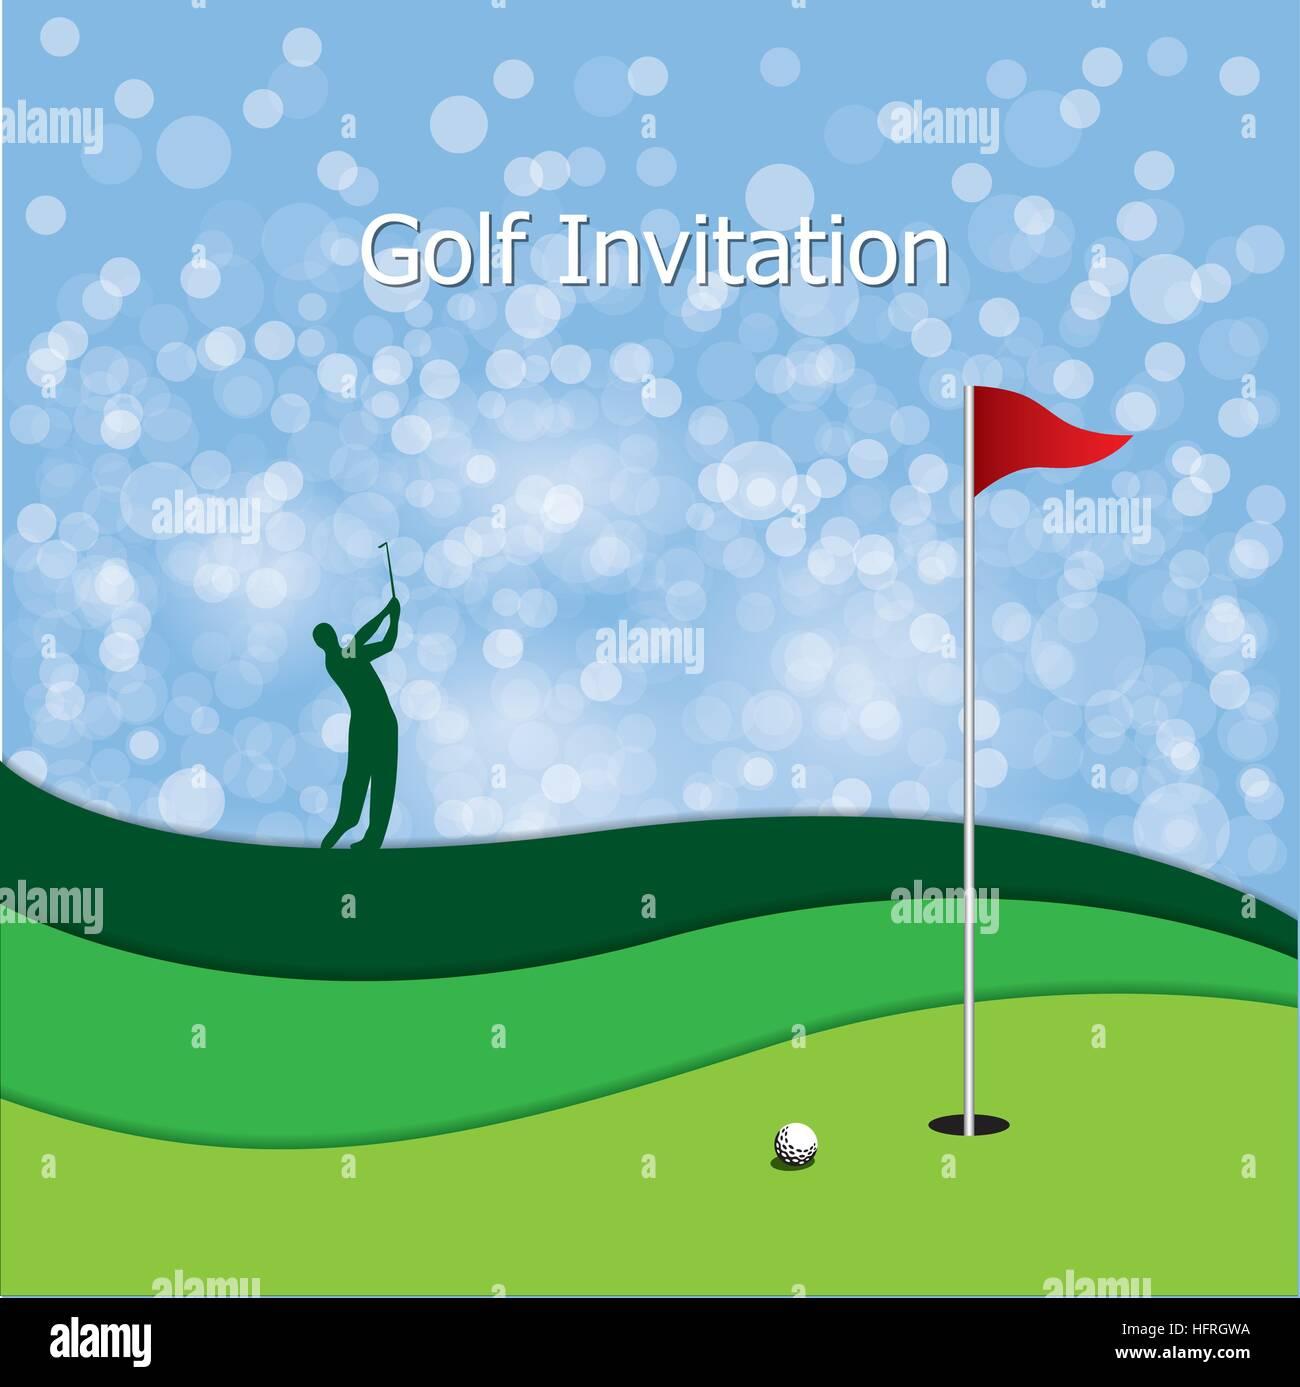 Golf tournament invitation graphic design silhouette golfer stock golf tournament invitation graphic design silhouette golfer swinging golf green golf ball flag and hole defocused light and blue background stopboris Choice Image